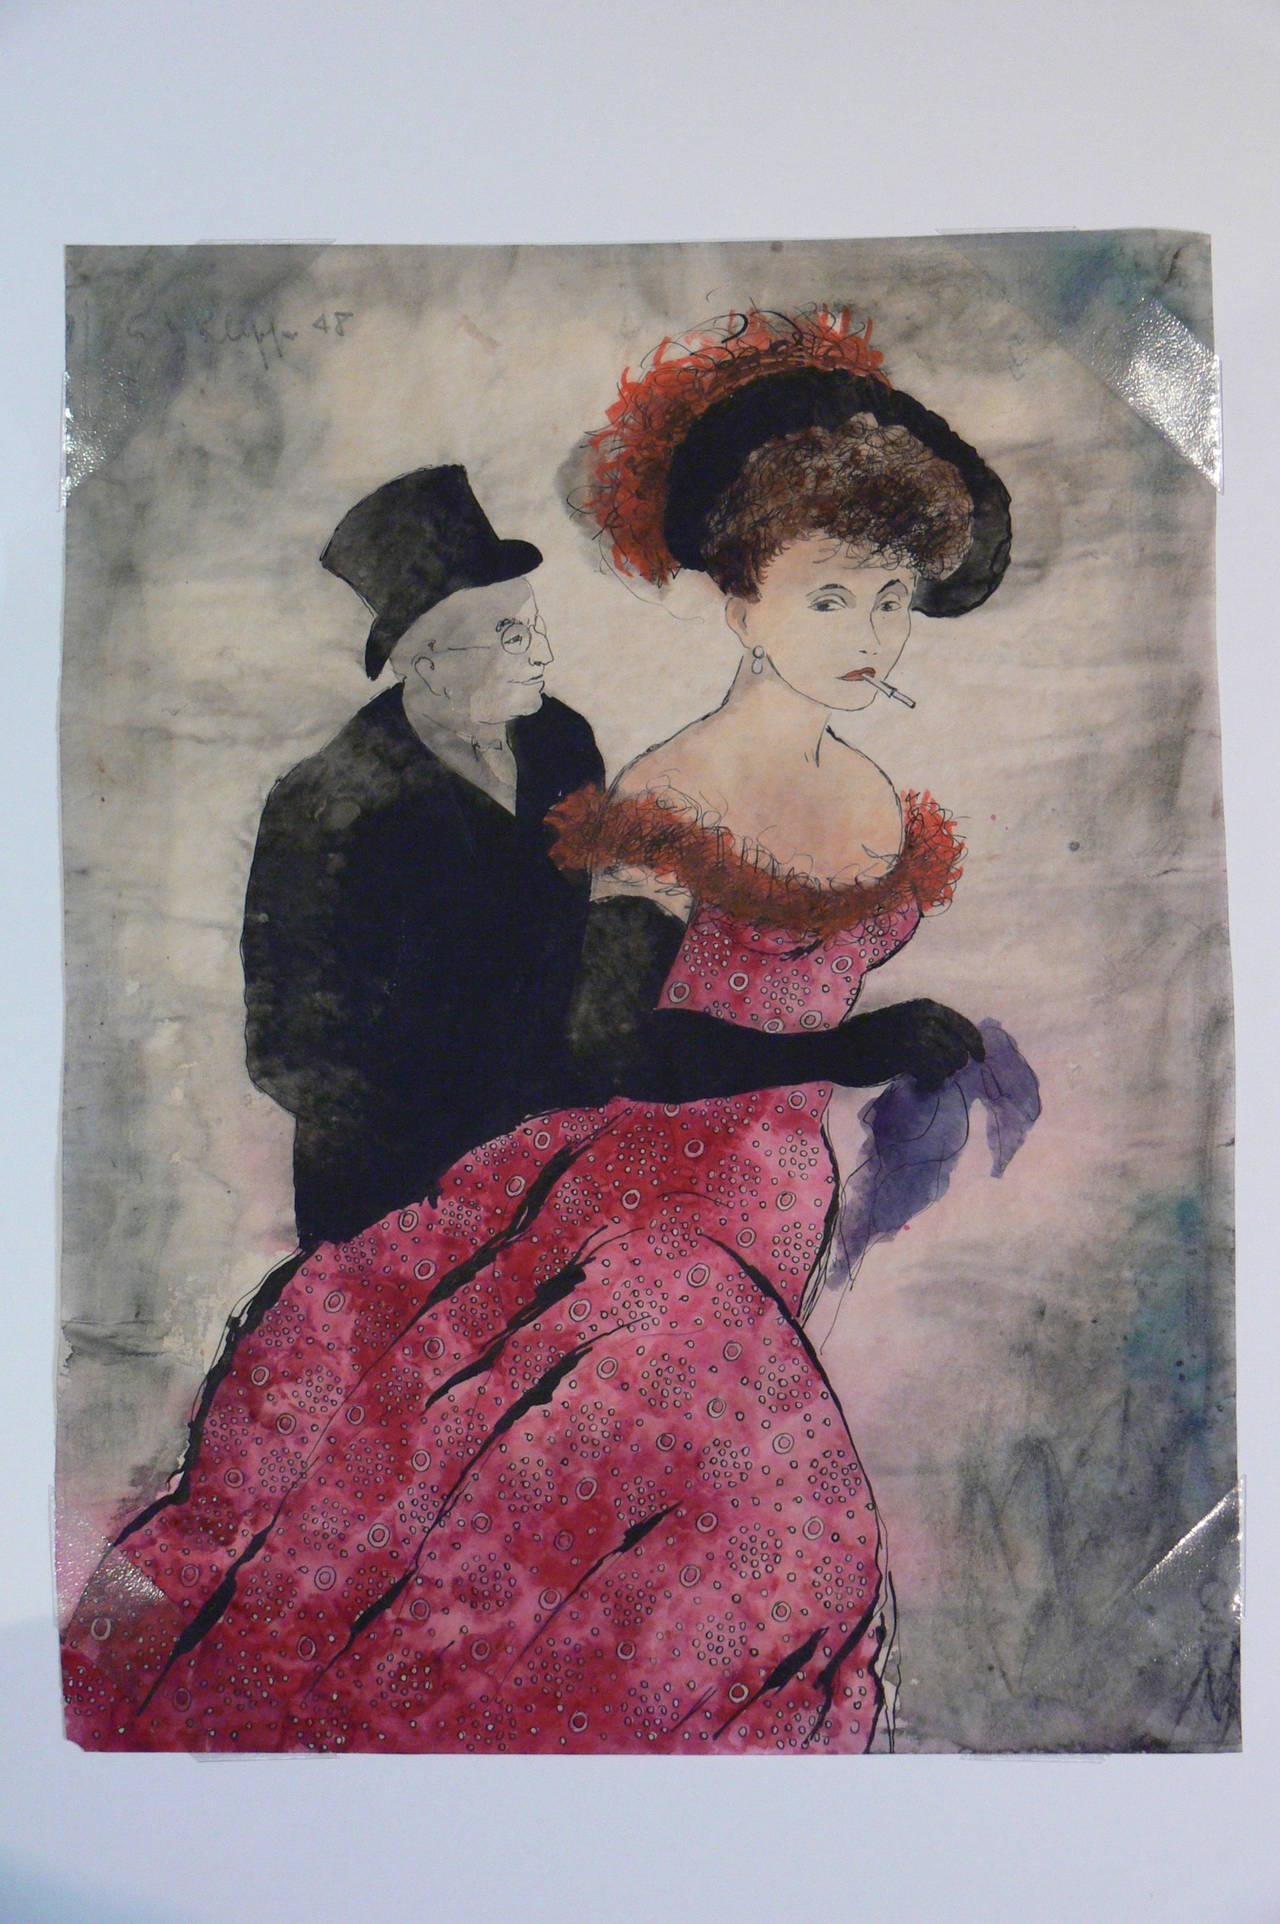 "Erhard Klepper Watercolor Gouache Painting "" In Begleitung"", 1948"